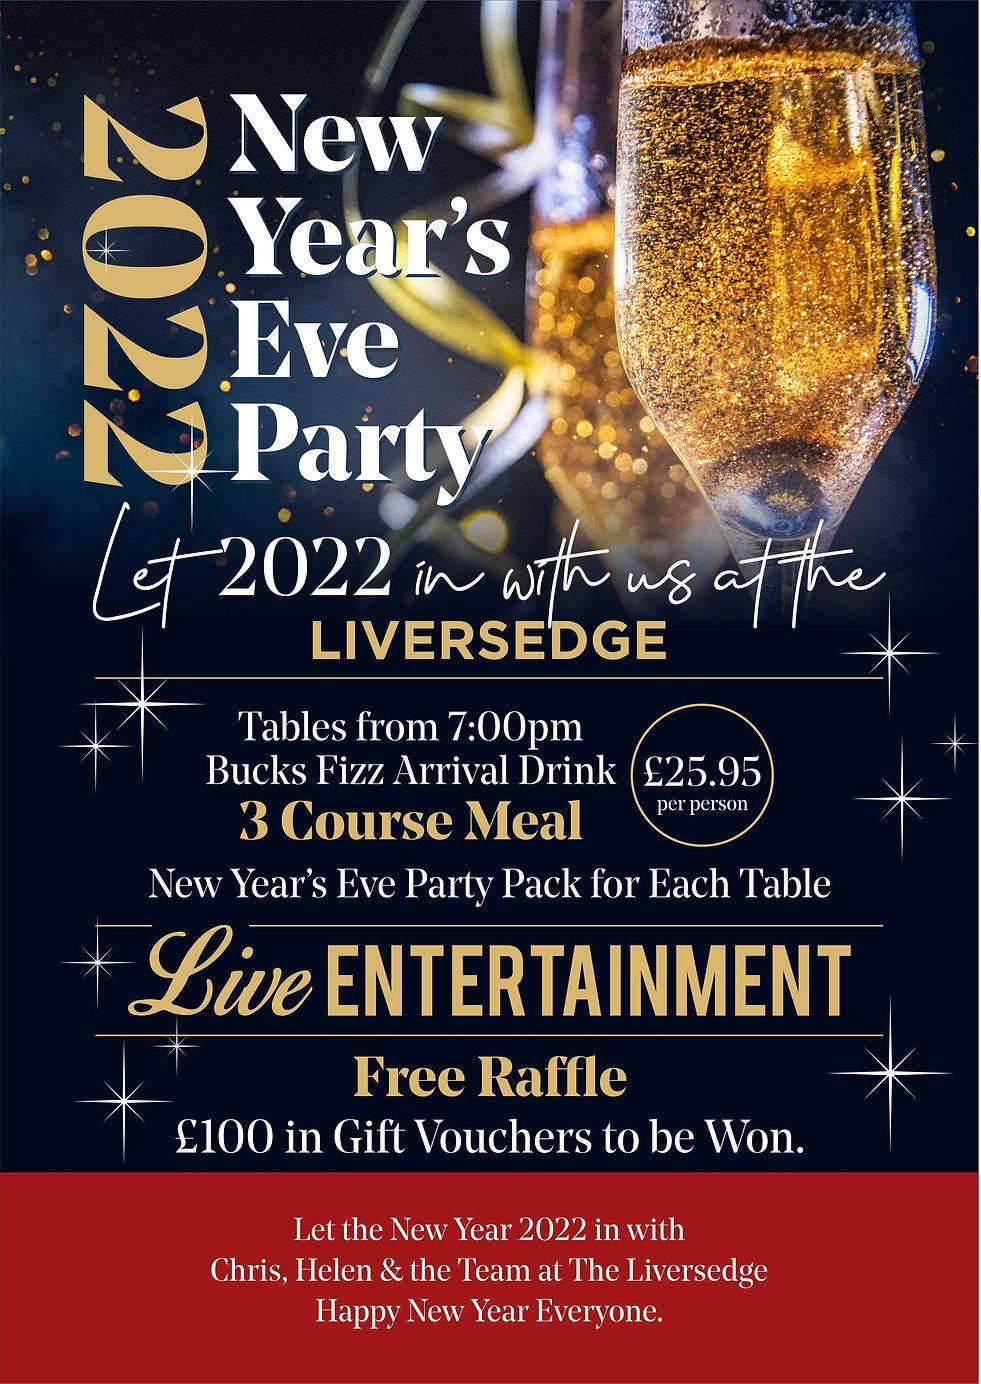 Liversedge NYE poster.jpg